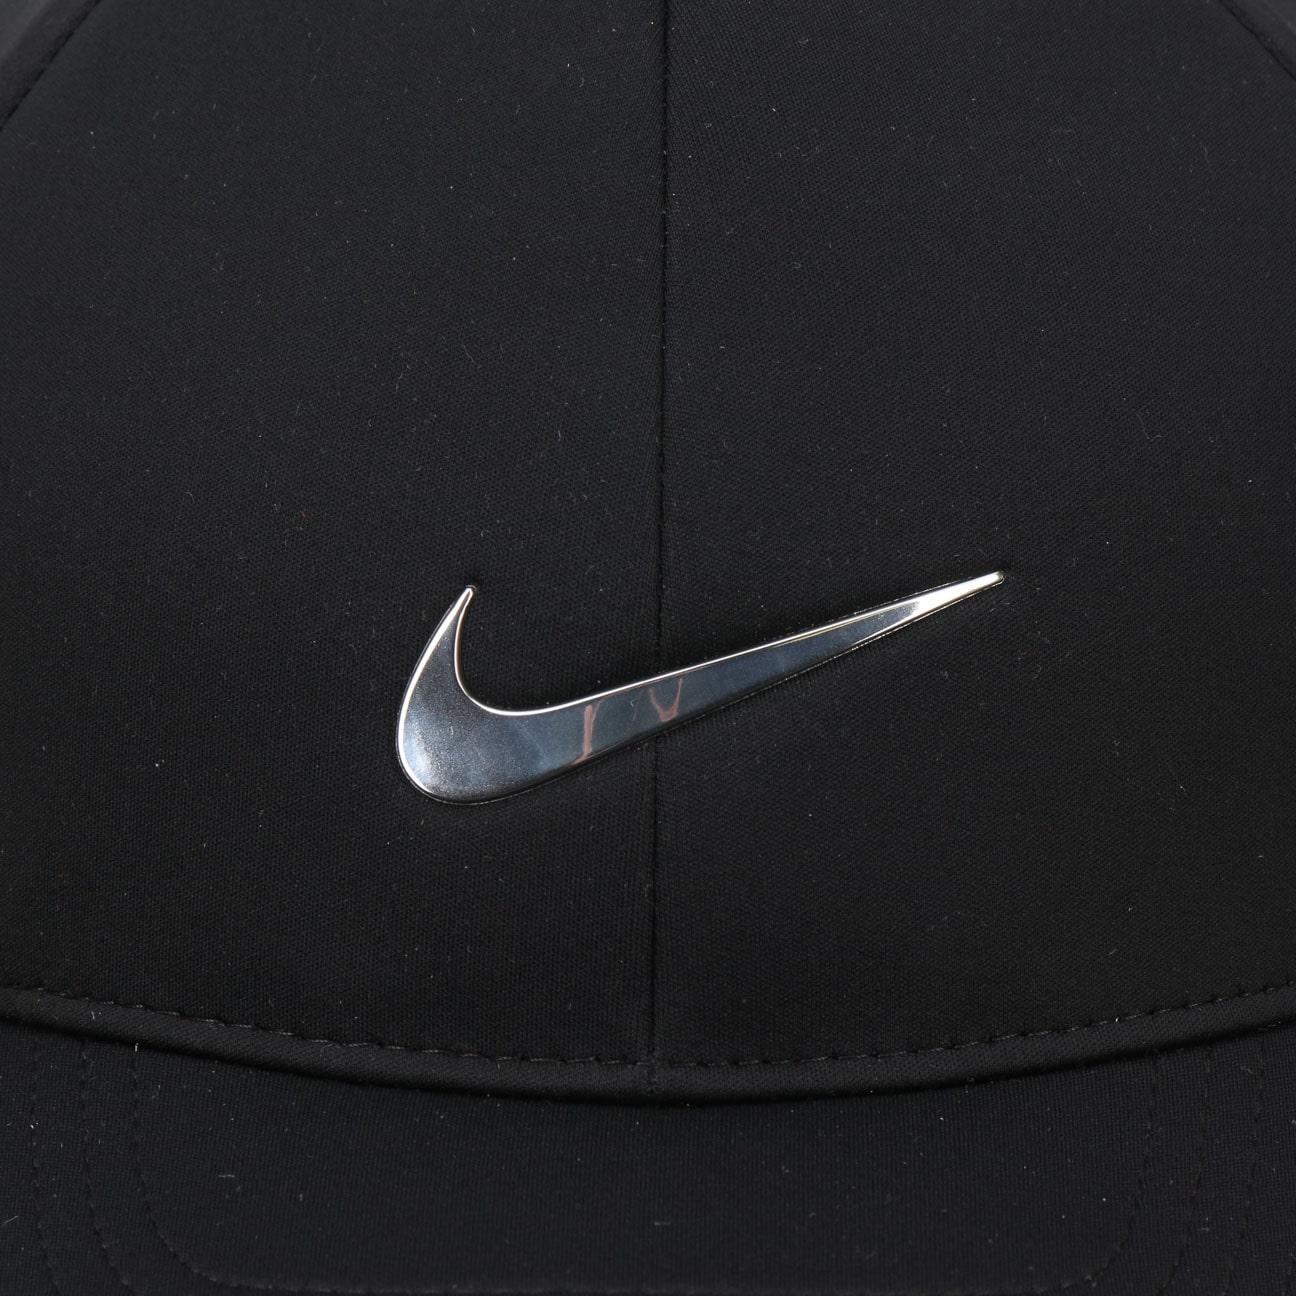 f2247c1ab9d12 ... Ultralight Storm-FIT Cap by Nike - black 3 ...